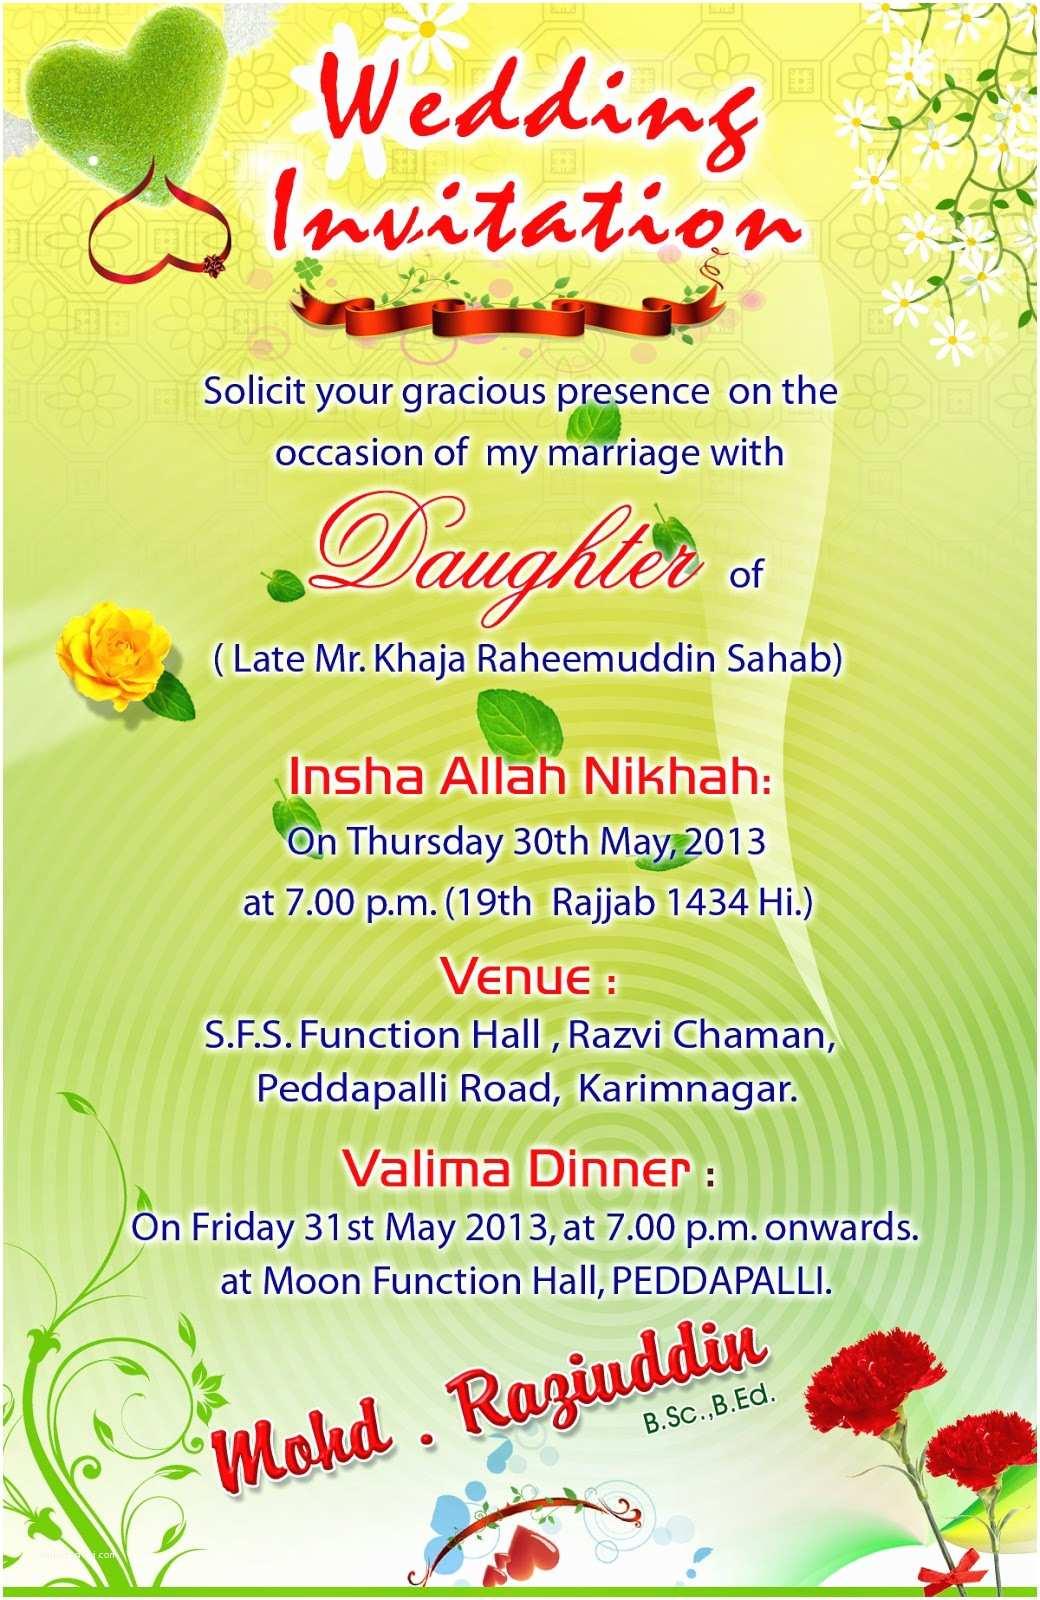 Indian Wedding Invitation Designs  Download Wedding Invitation Card Design